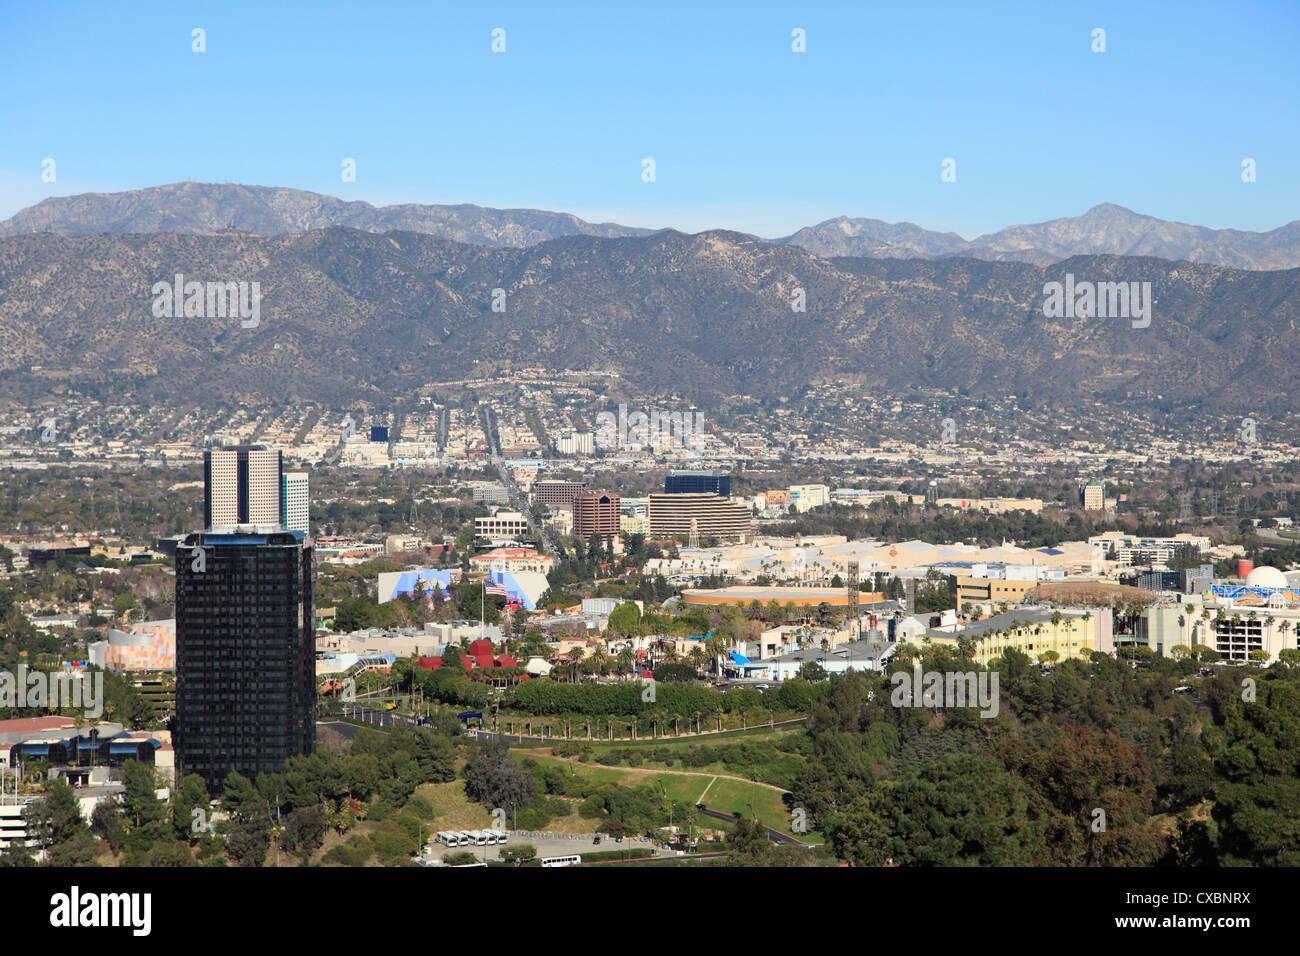 Universal Studios, San Fernando Valley, San Gabriel Mountains, Burbank, Los Angeles, California, United States of - Stock Image